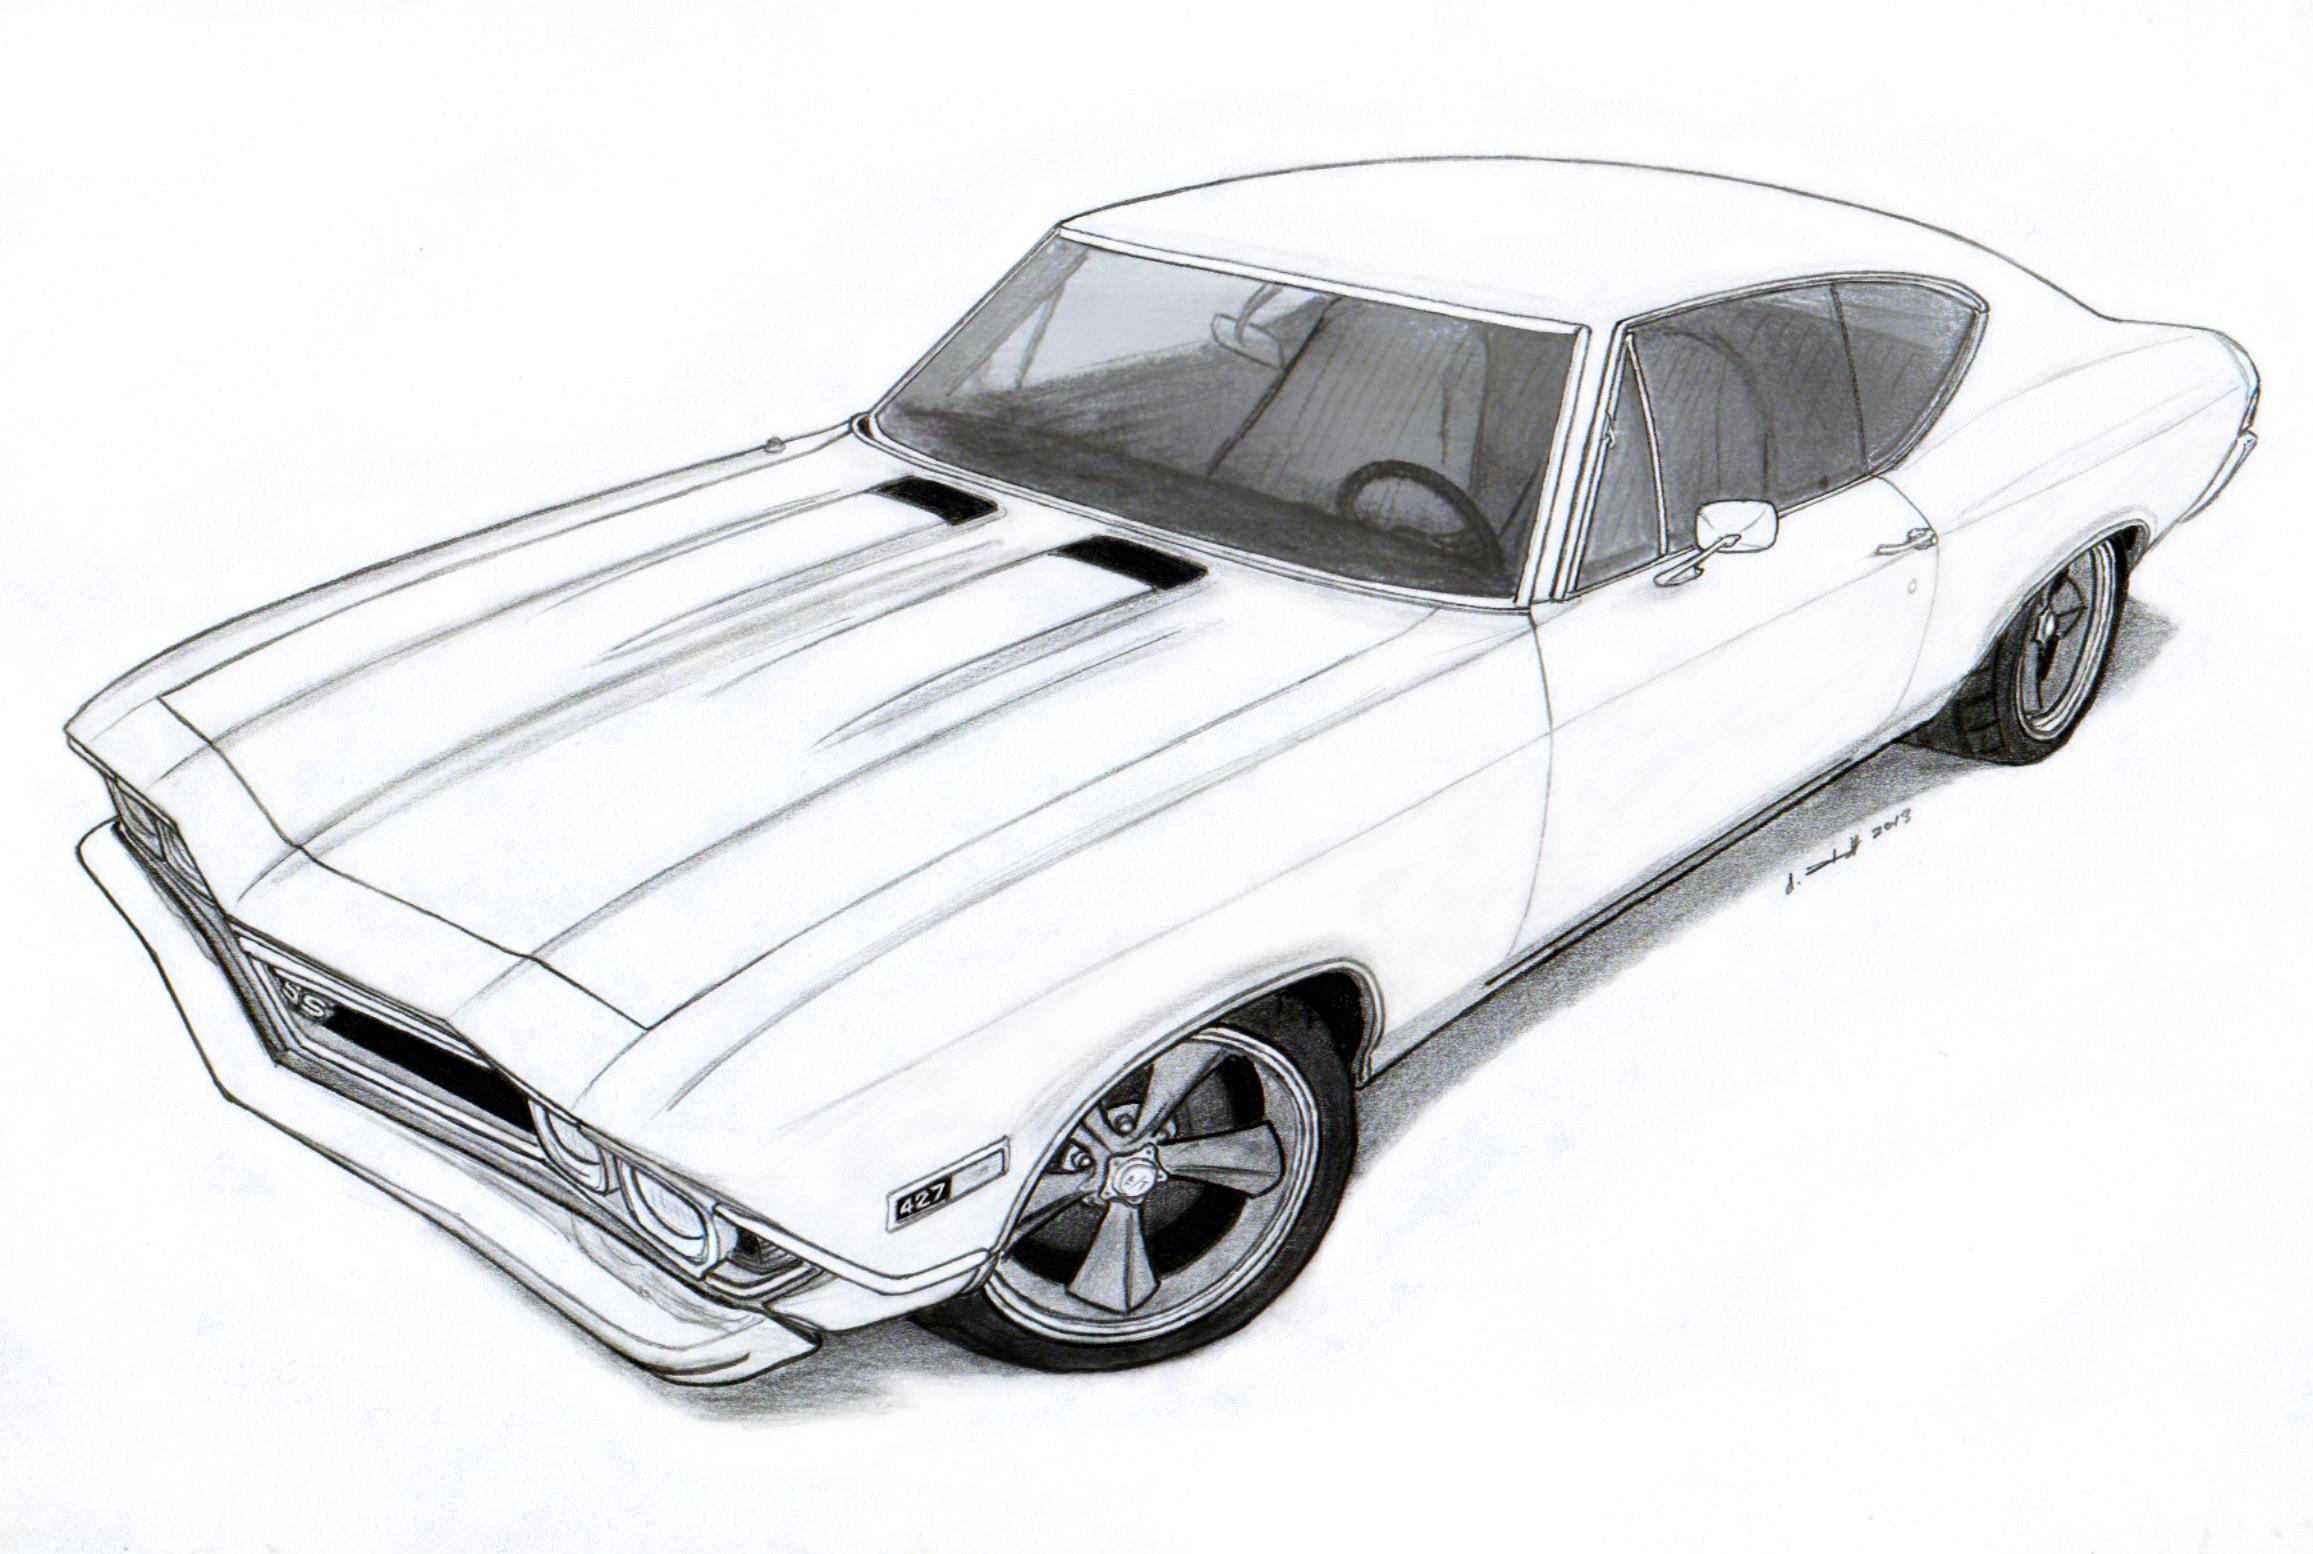 1969 Chevrolet Impala SS 427425 HP L72 2Door Sport Coupe